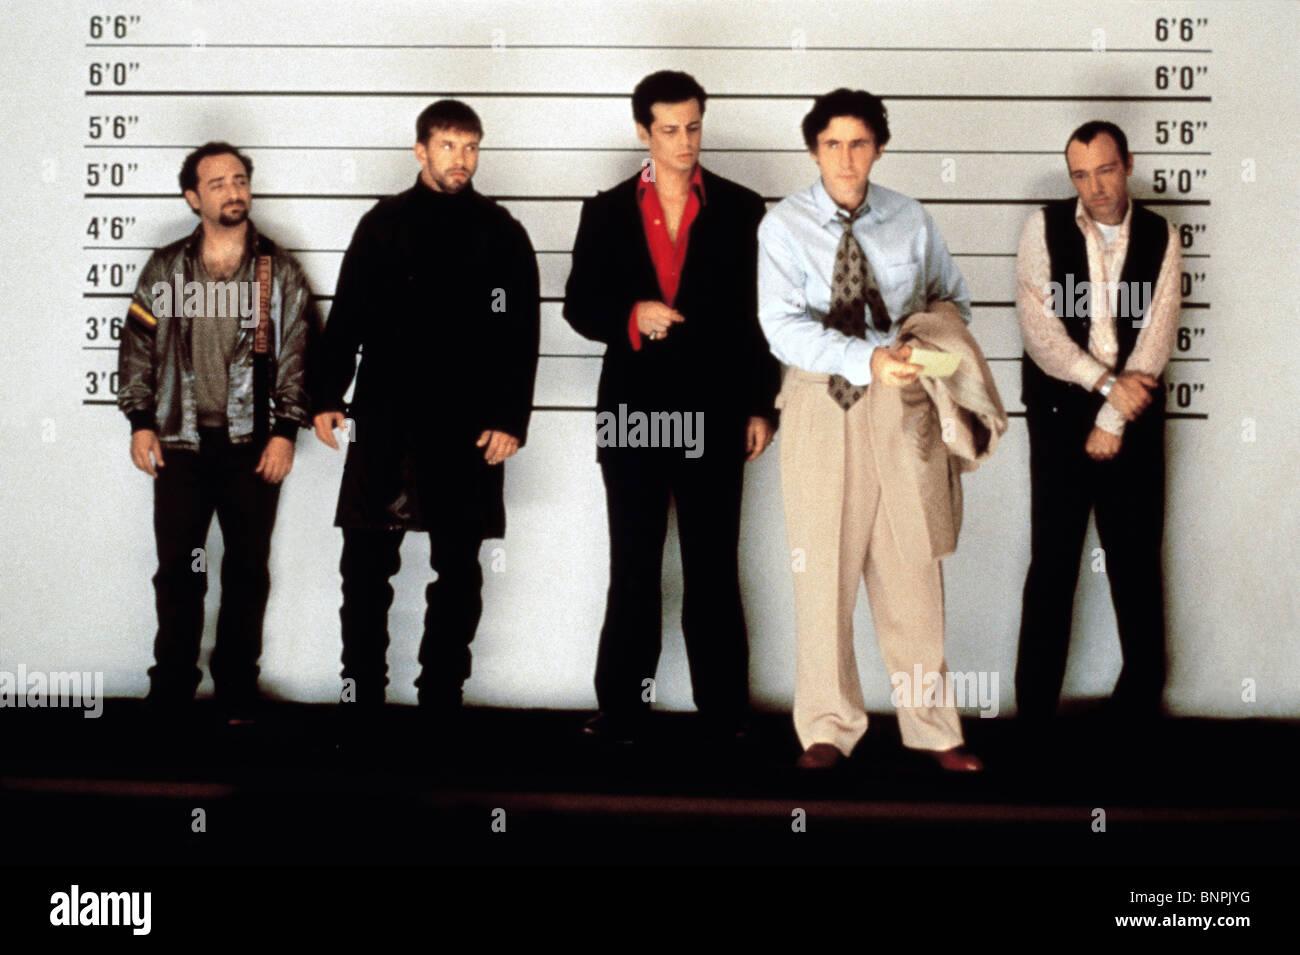 Stephen Baldwin Usual Suspects | www.imgkid.com - The ...